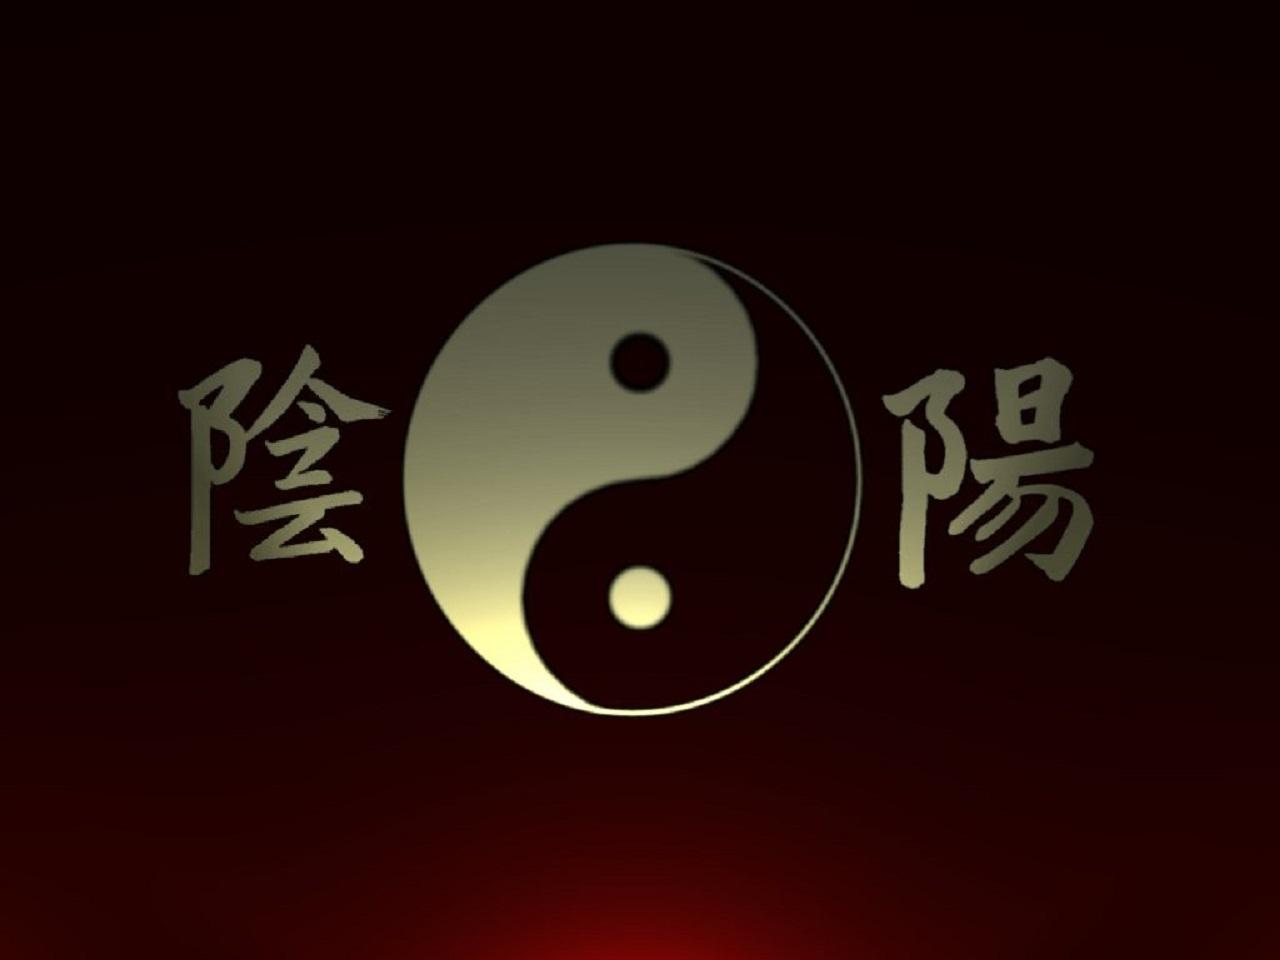 Yin Yang Wallpaper Images Wallpaper | WallpaperLepi